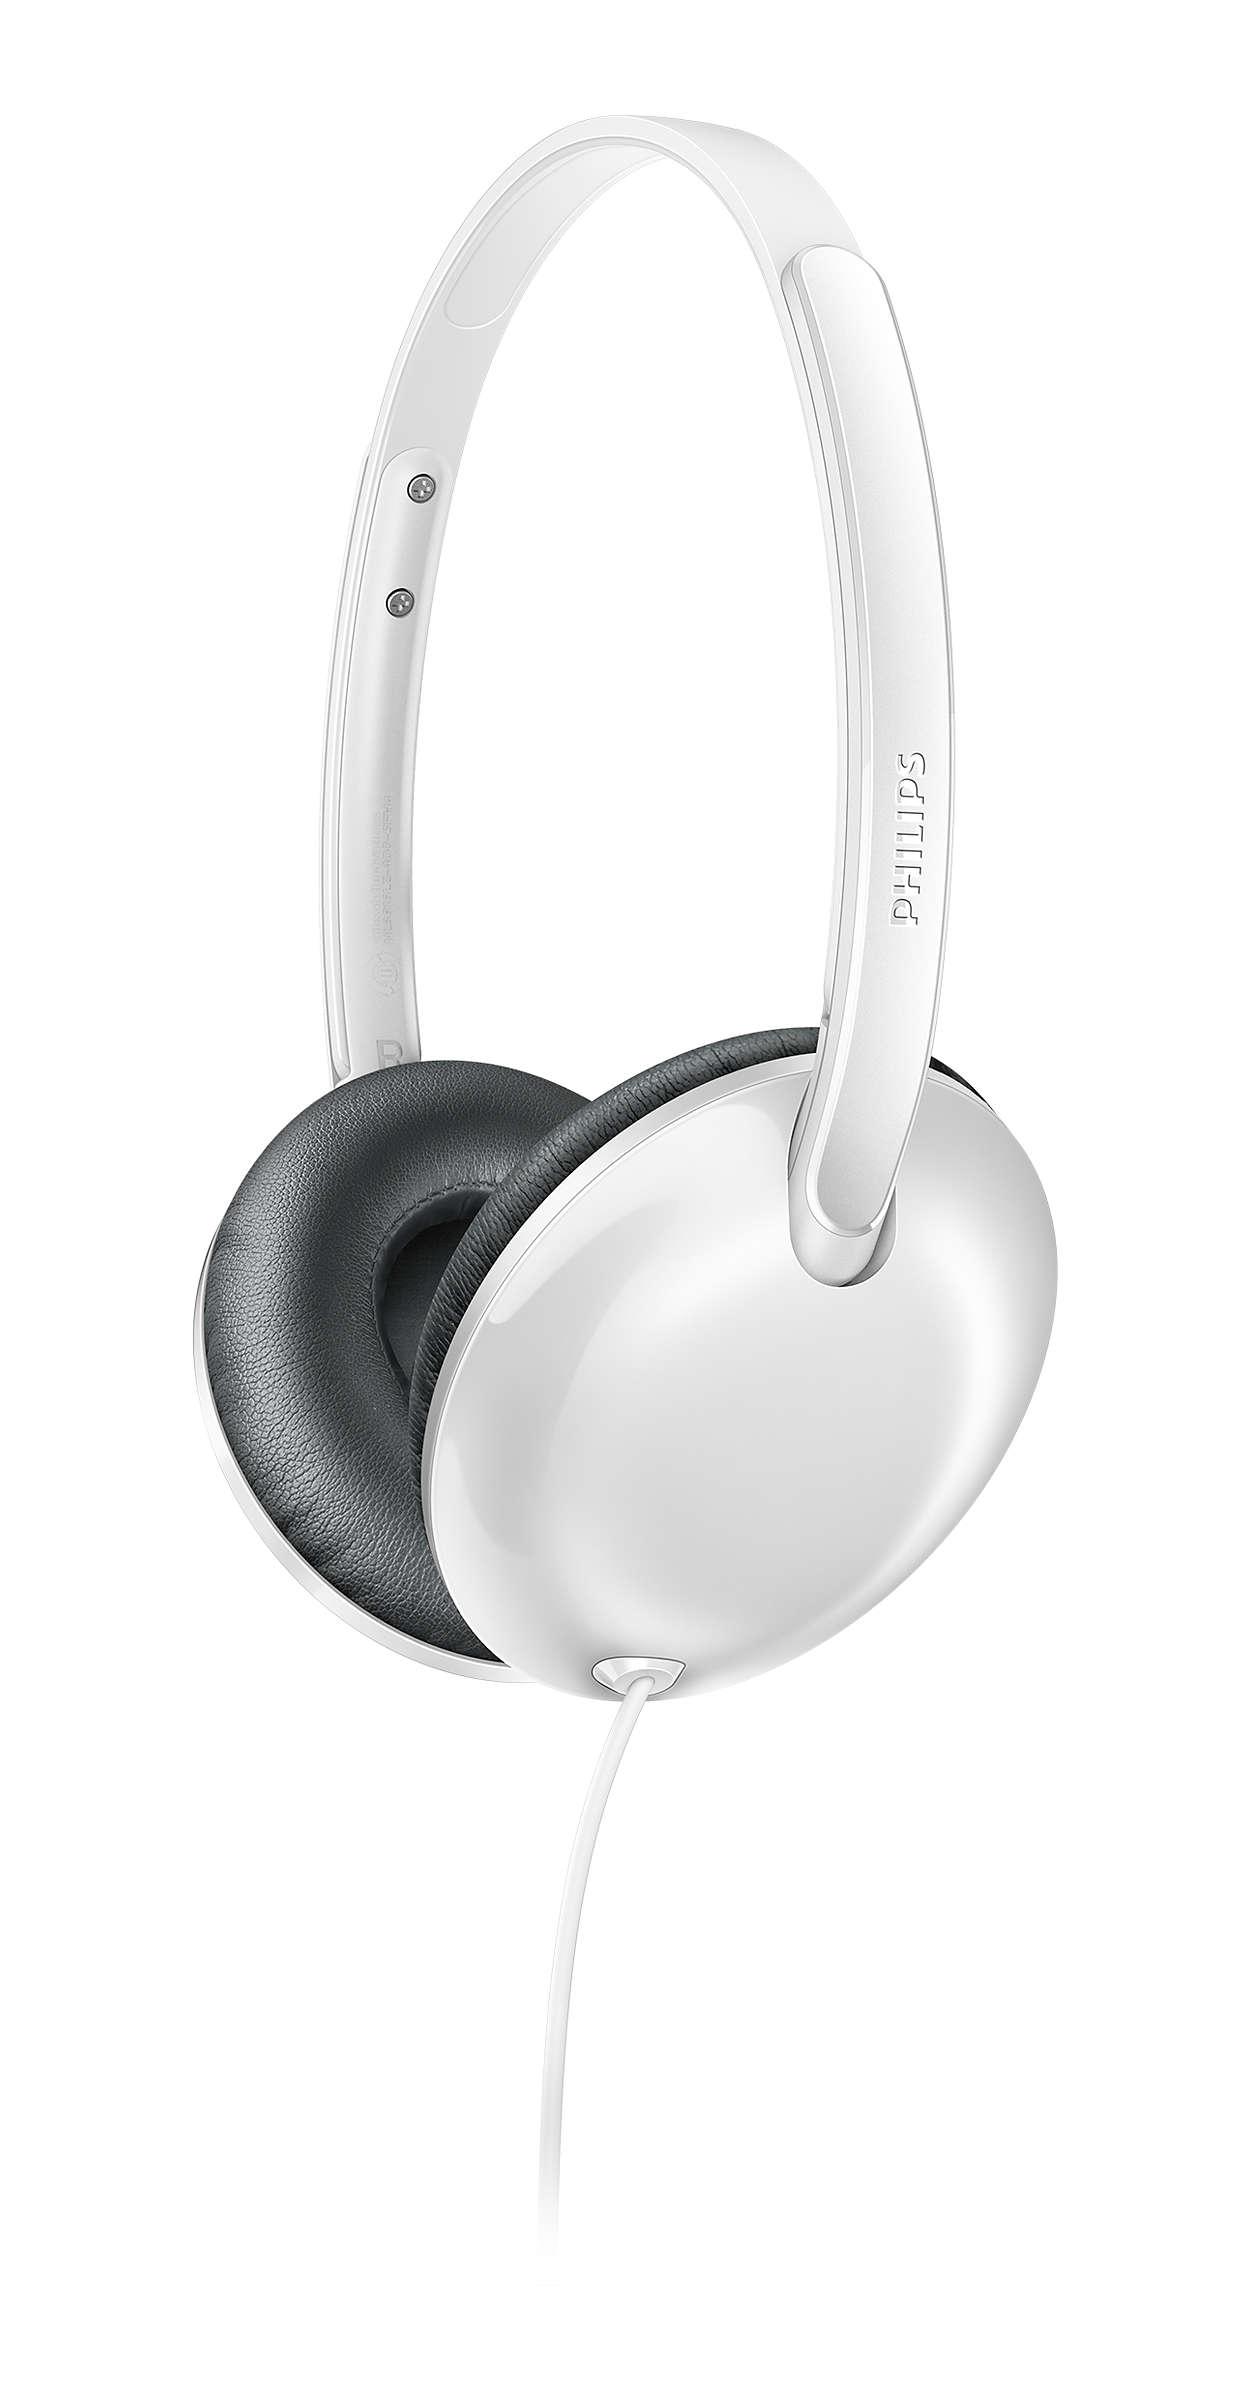 Gravity-defying headphones